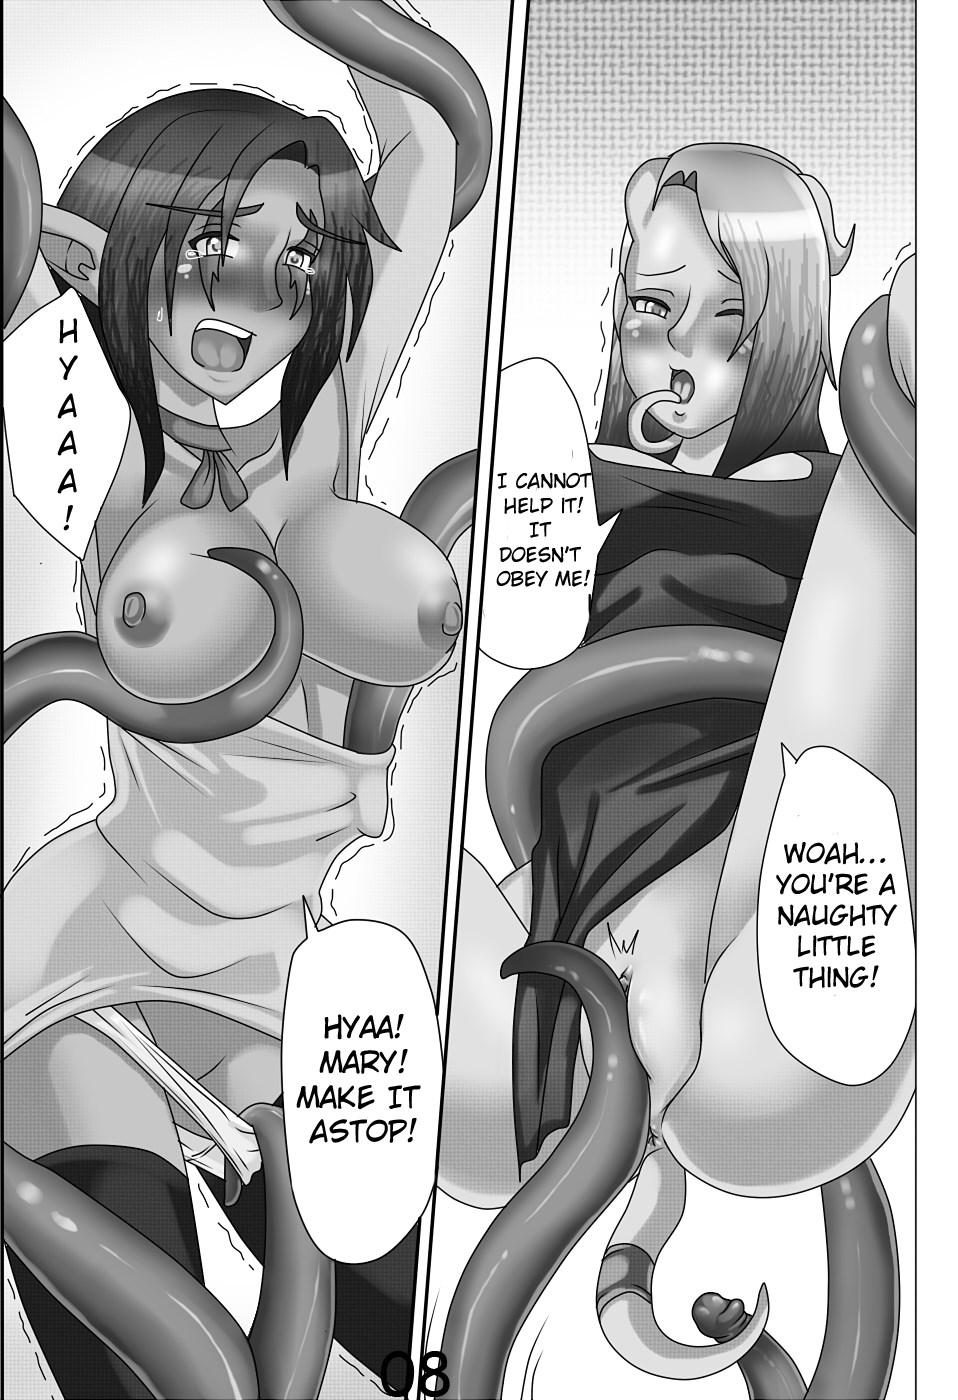 world of warcraft erotica